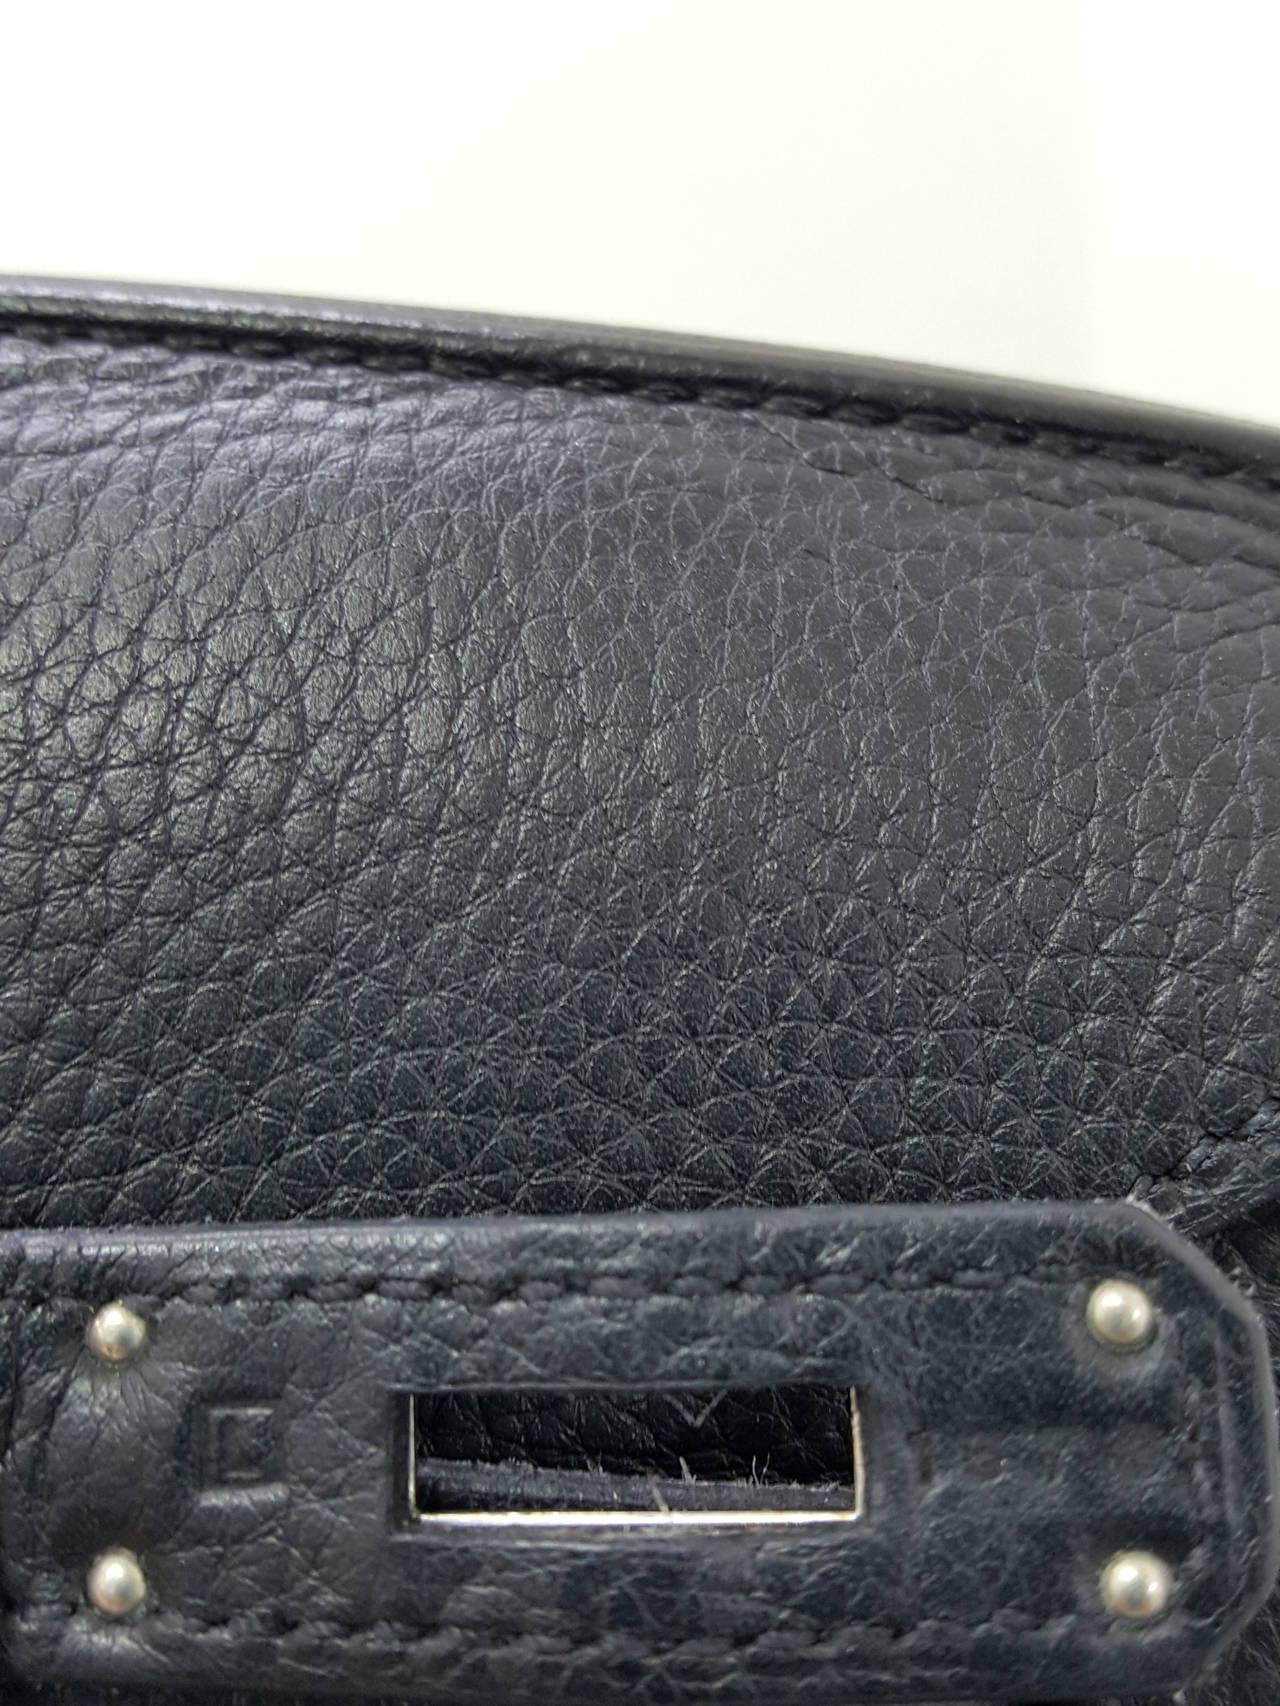 HERMES Birkin 35 CM In Black Clemence Leather With Palladium Hardware. 10